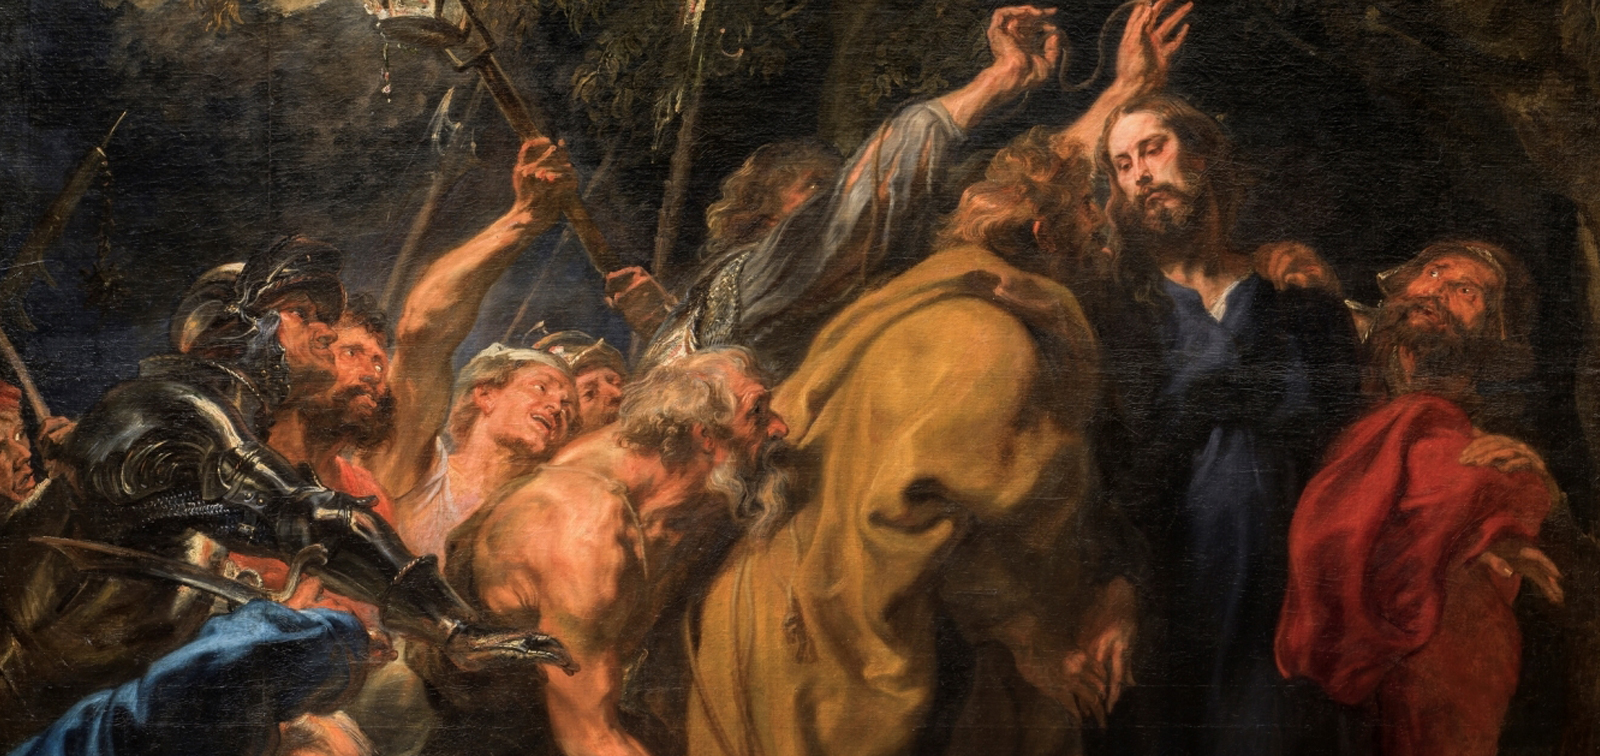 Una obra, un artista: <em>El Prendimiento de Cristo</em>, de Van Dyck